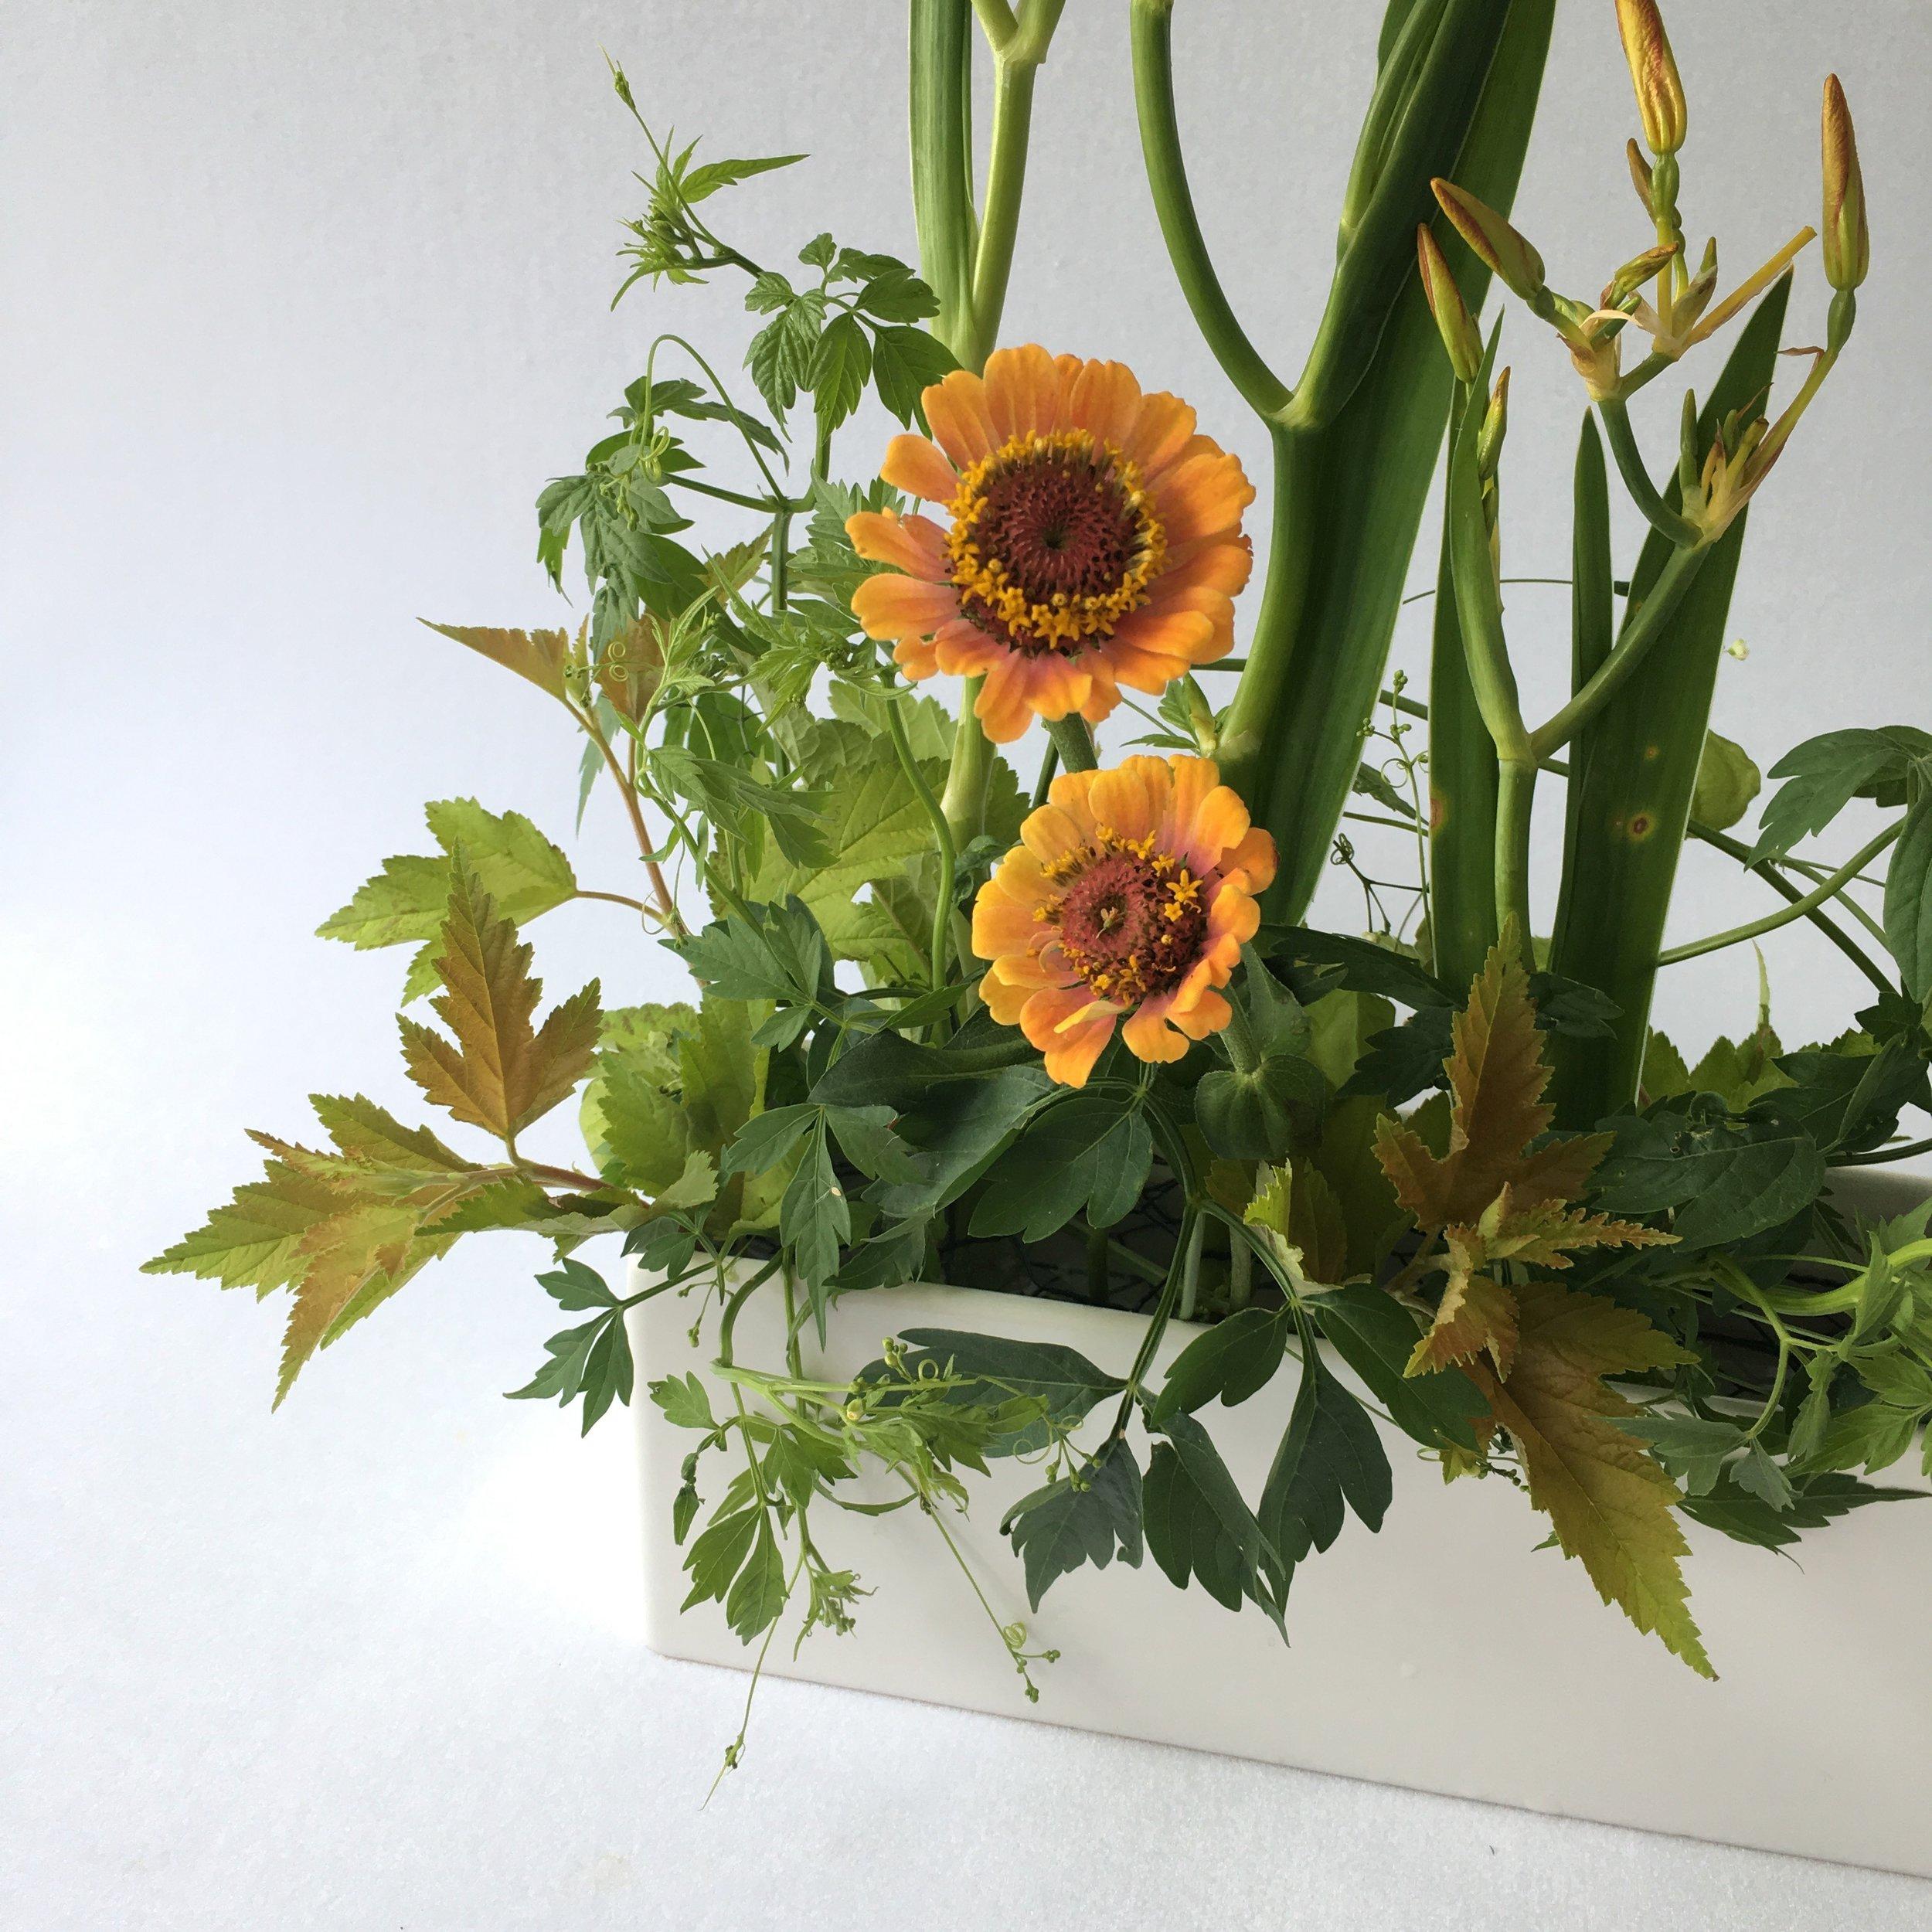 Negative Space In Floral Design